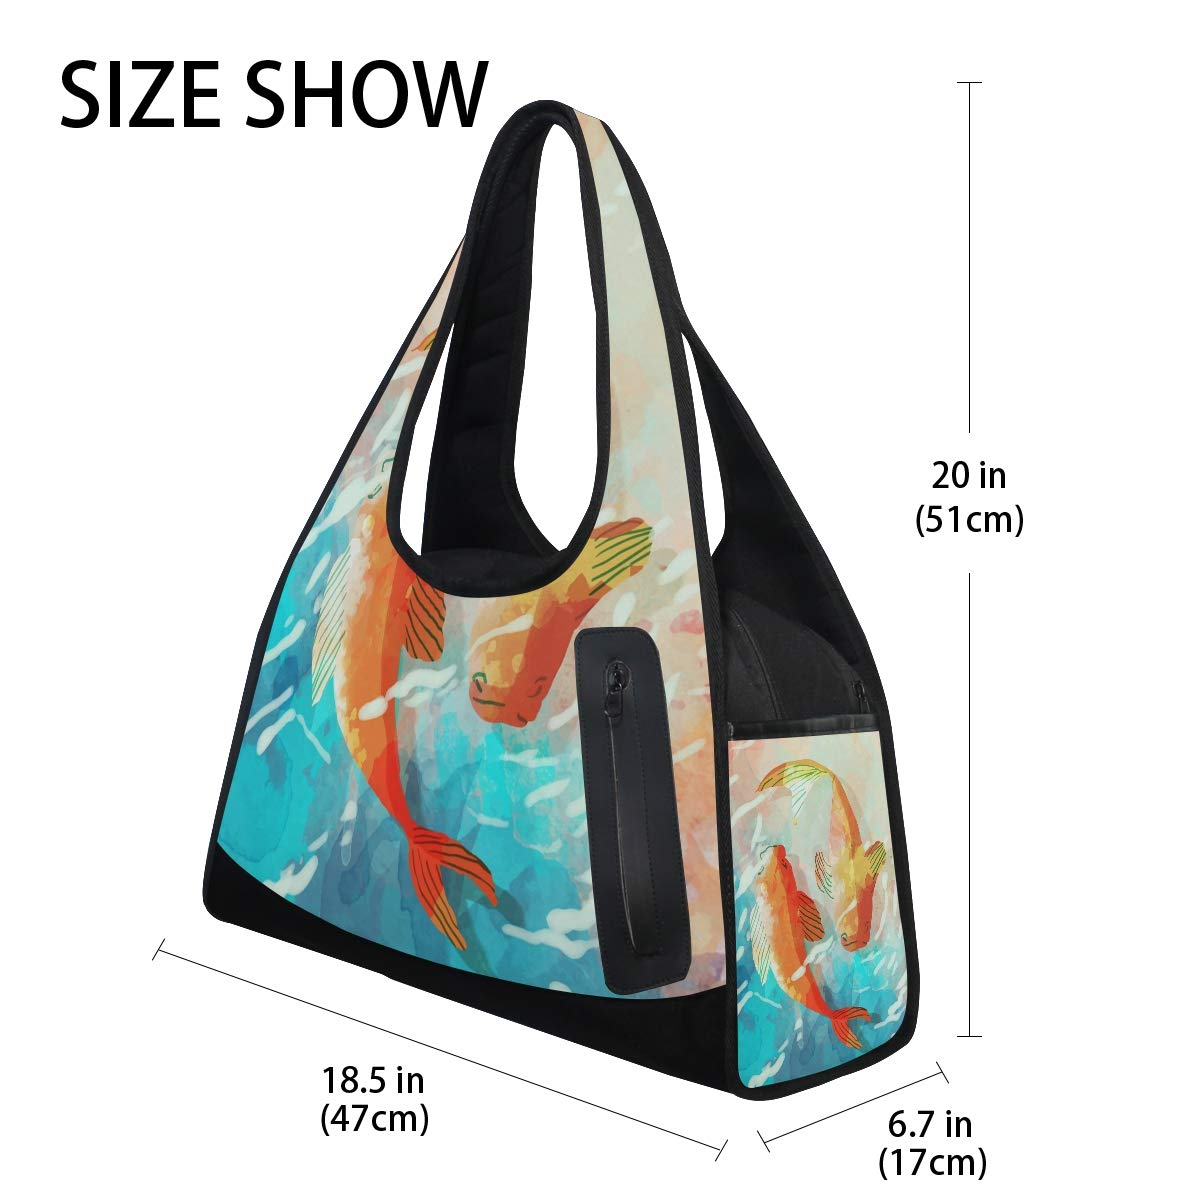 Carp Pond Women Sports Gym Totes Bag Multi-Function Nylon Travel Shoulder Bag